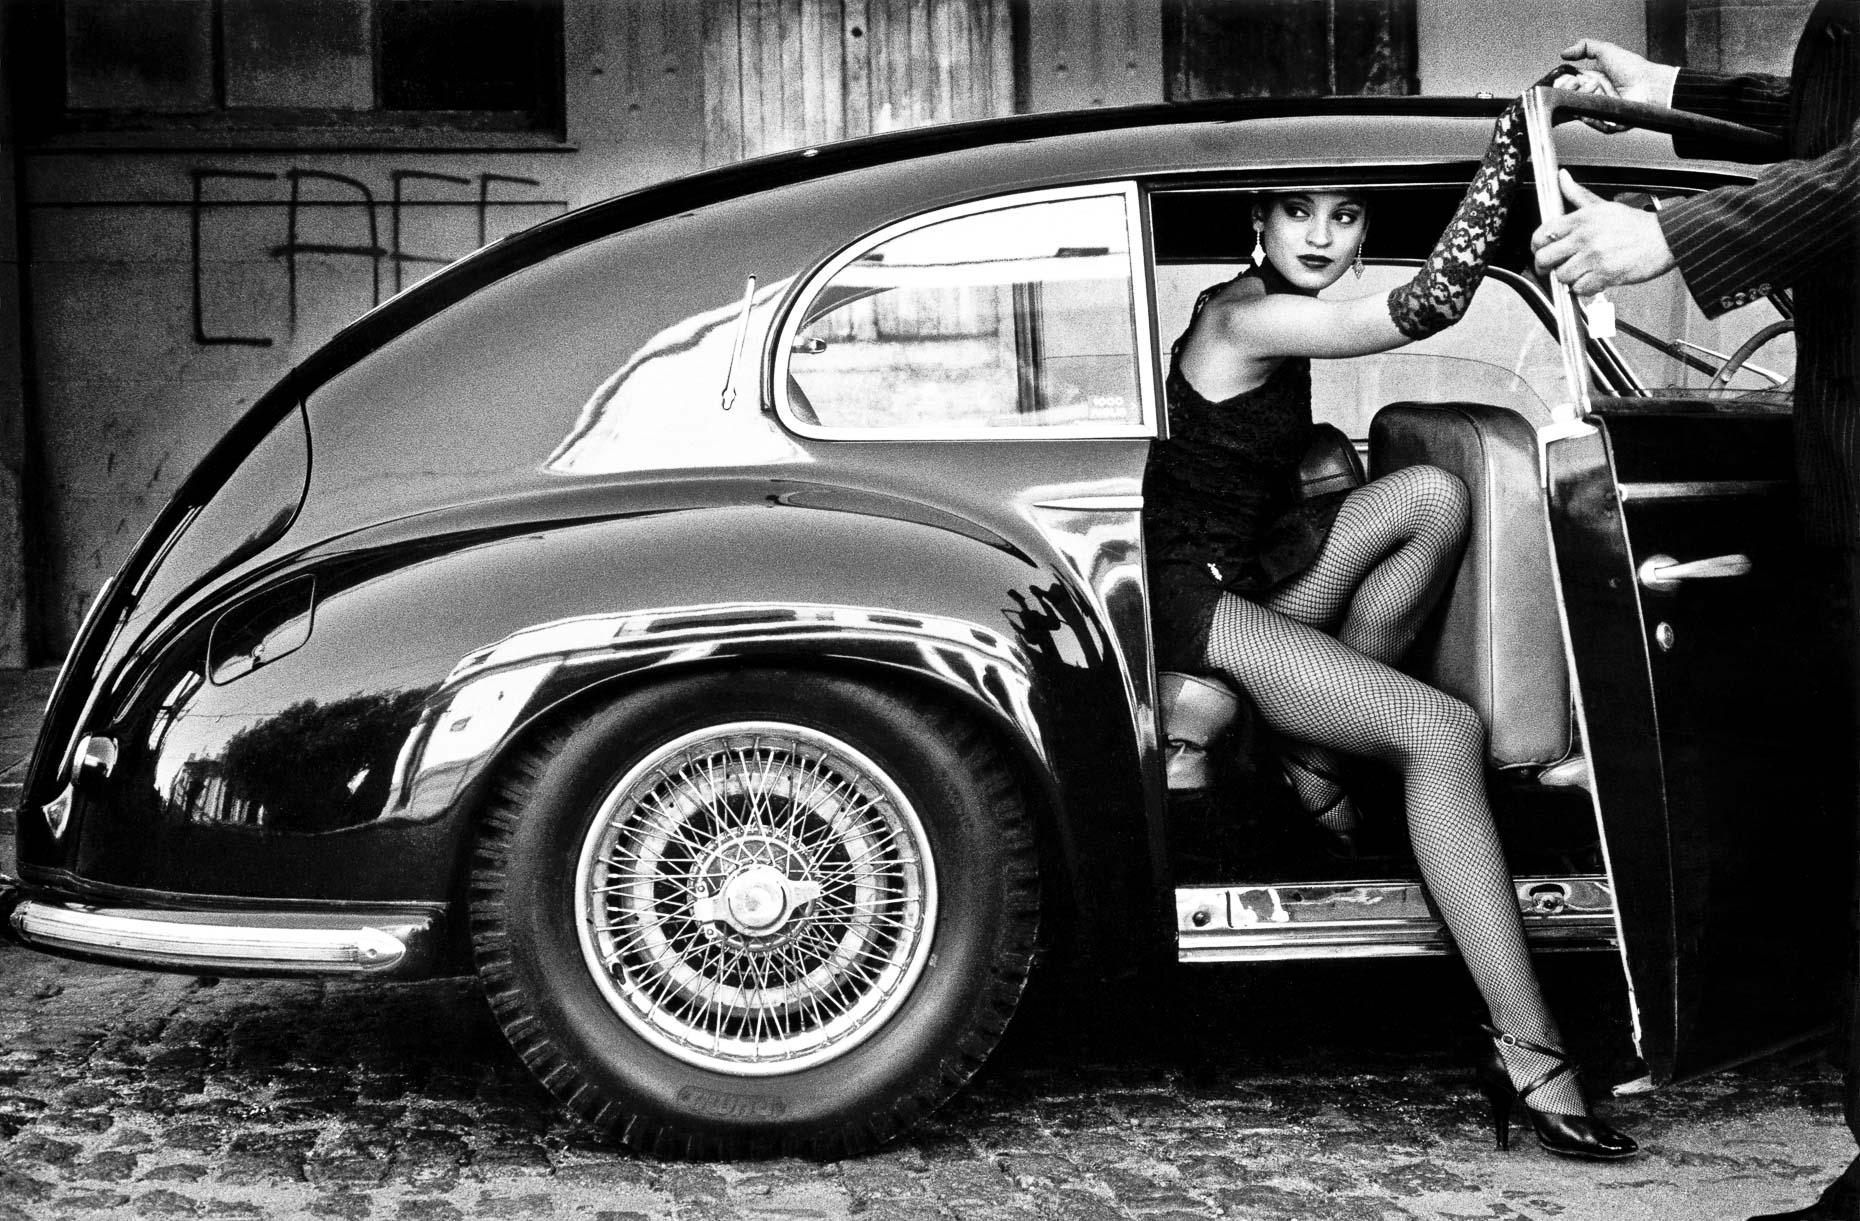 Photographie : The last tango, Alfa Romeo Freccia d'Oro 1948, par Christopher Pillitz